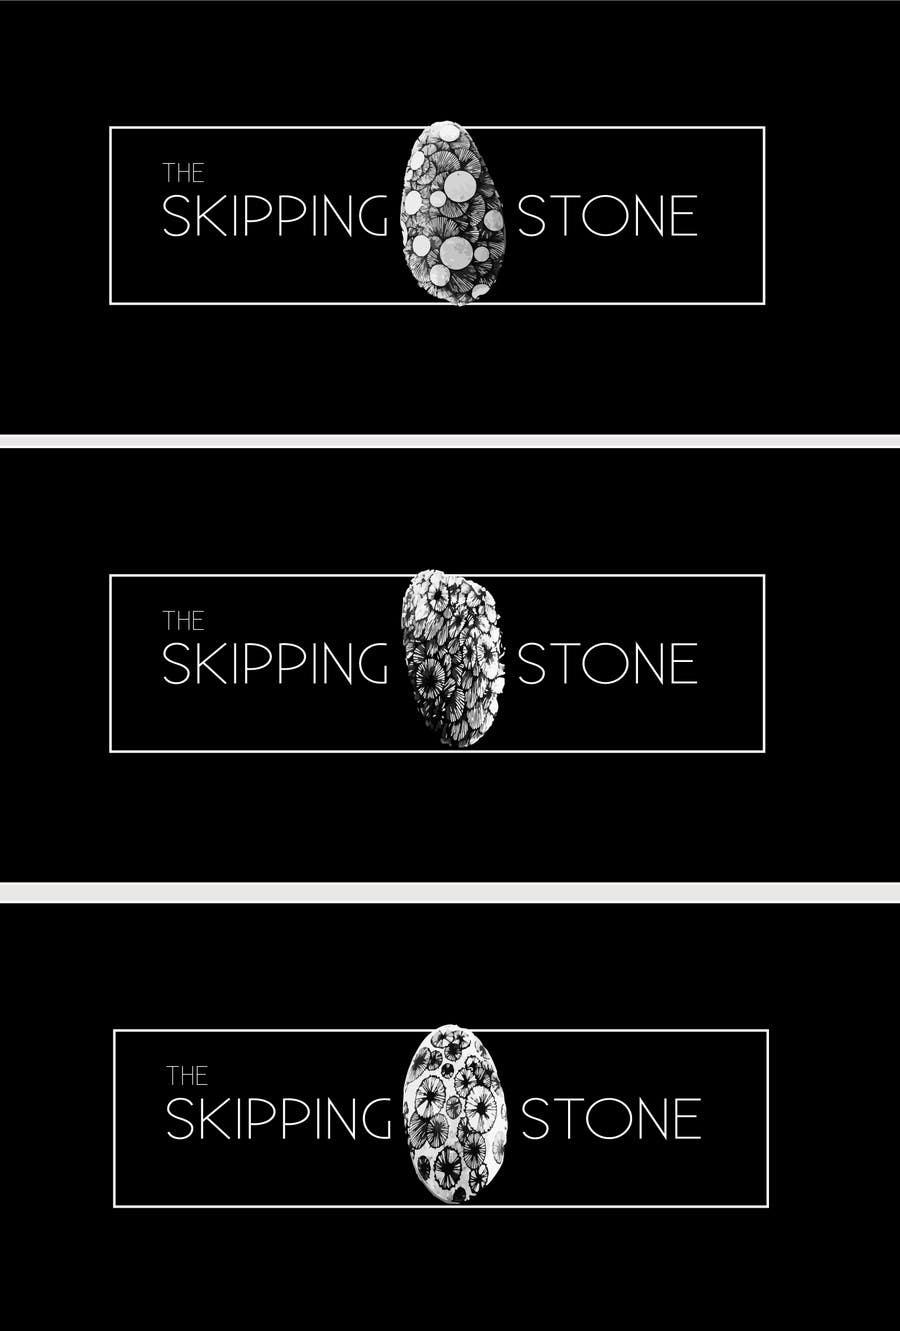 Bài tham dự cuộc thi #33 cho Design a Logo for TheSkippingStone